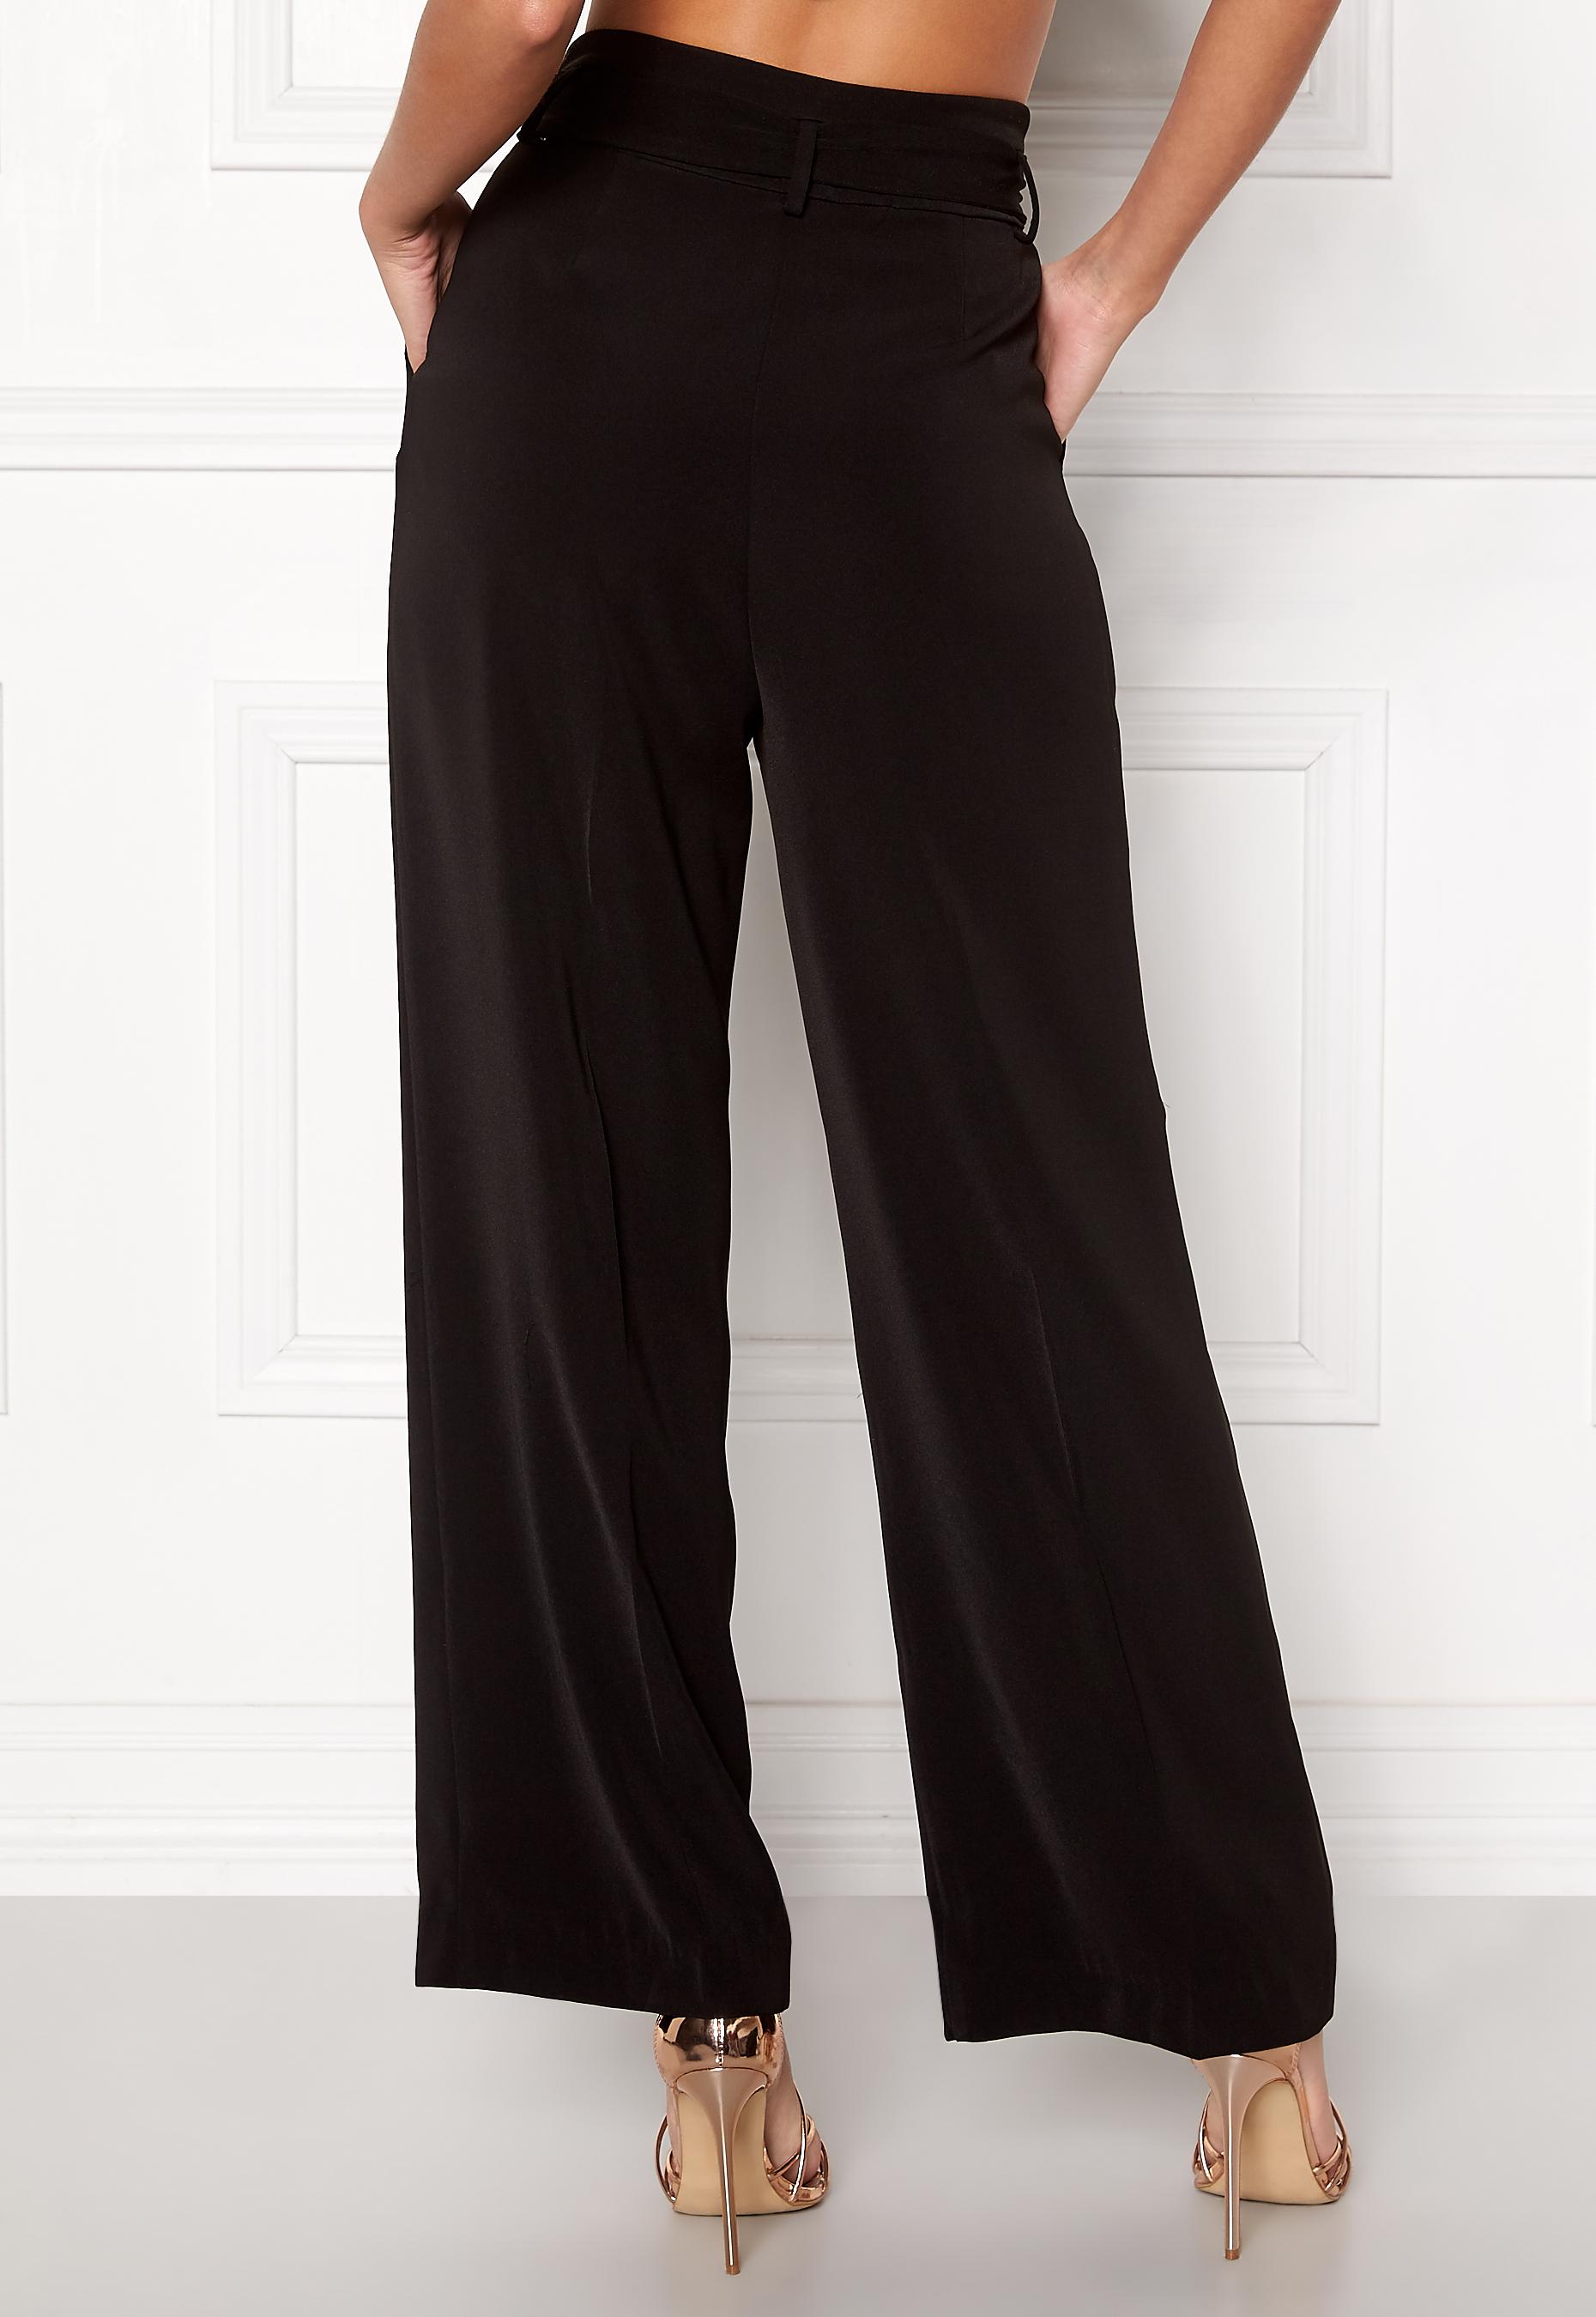 VILA Blamy HW Pant Black - Bubbleroom 18be3fd9a0378